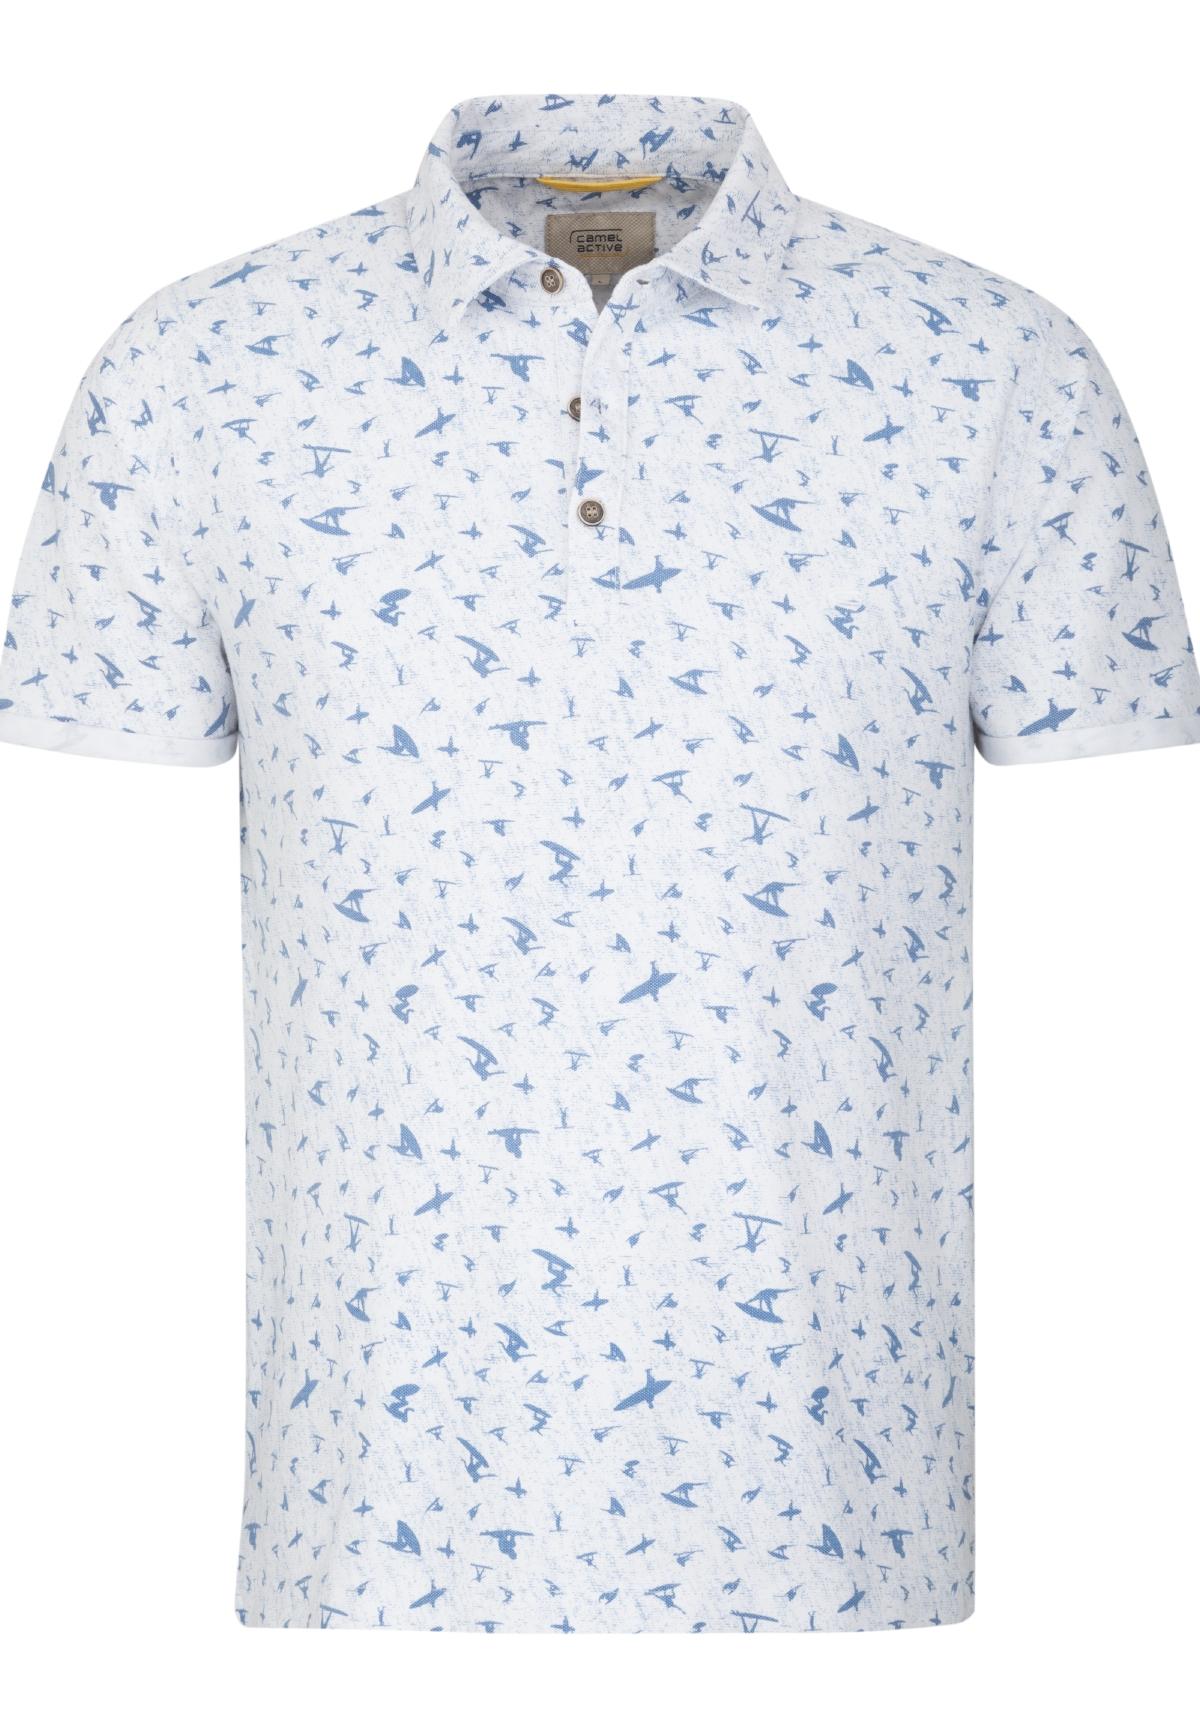 Camel-Active-Herren-Shirt-Poloshirt-Pique-Regular-Fit-NEU Indexbild 7